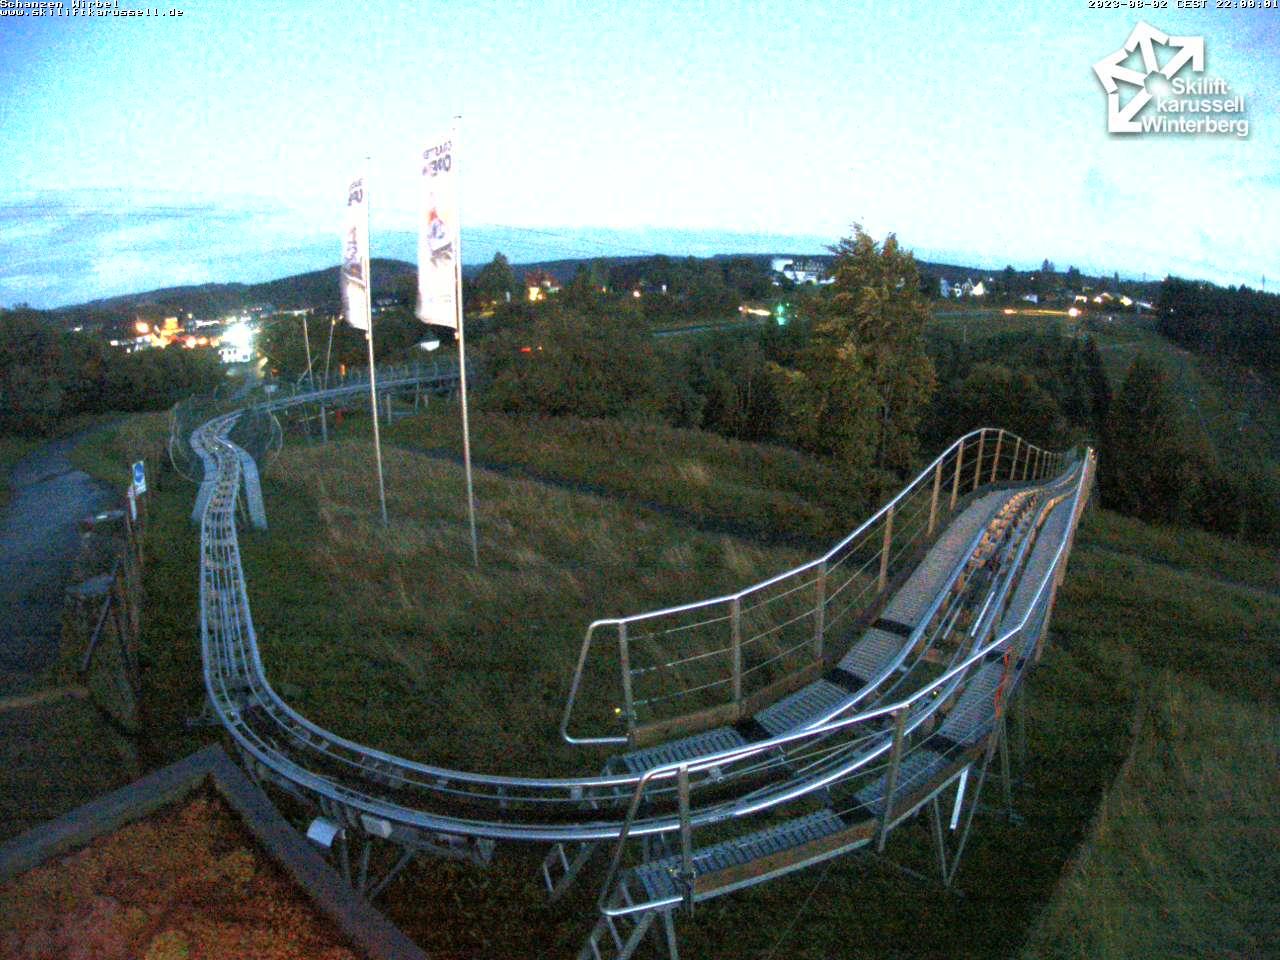 Webcam Schanzen Wirbel - Skiliftkarussell Winterberg